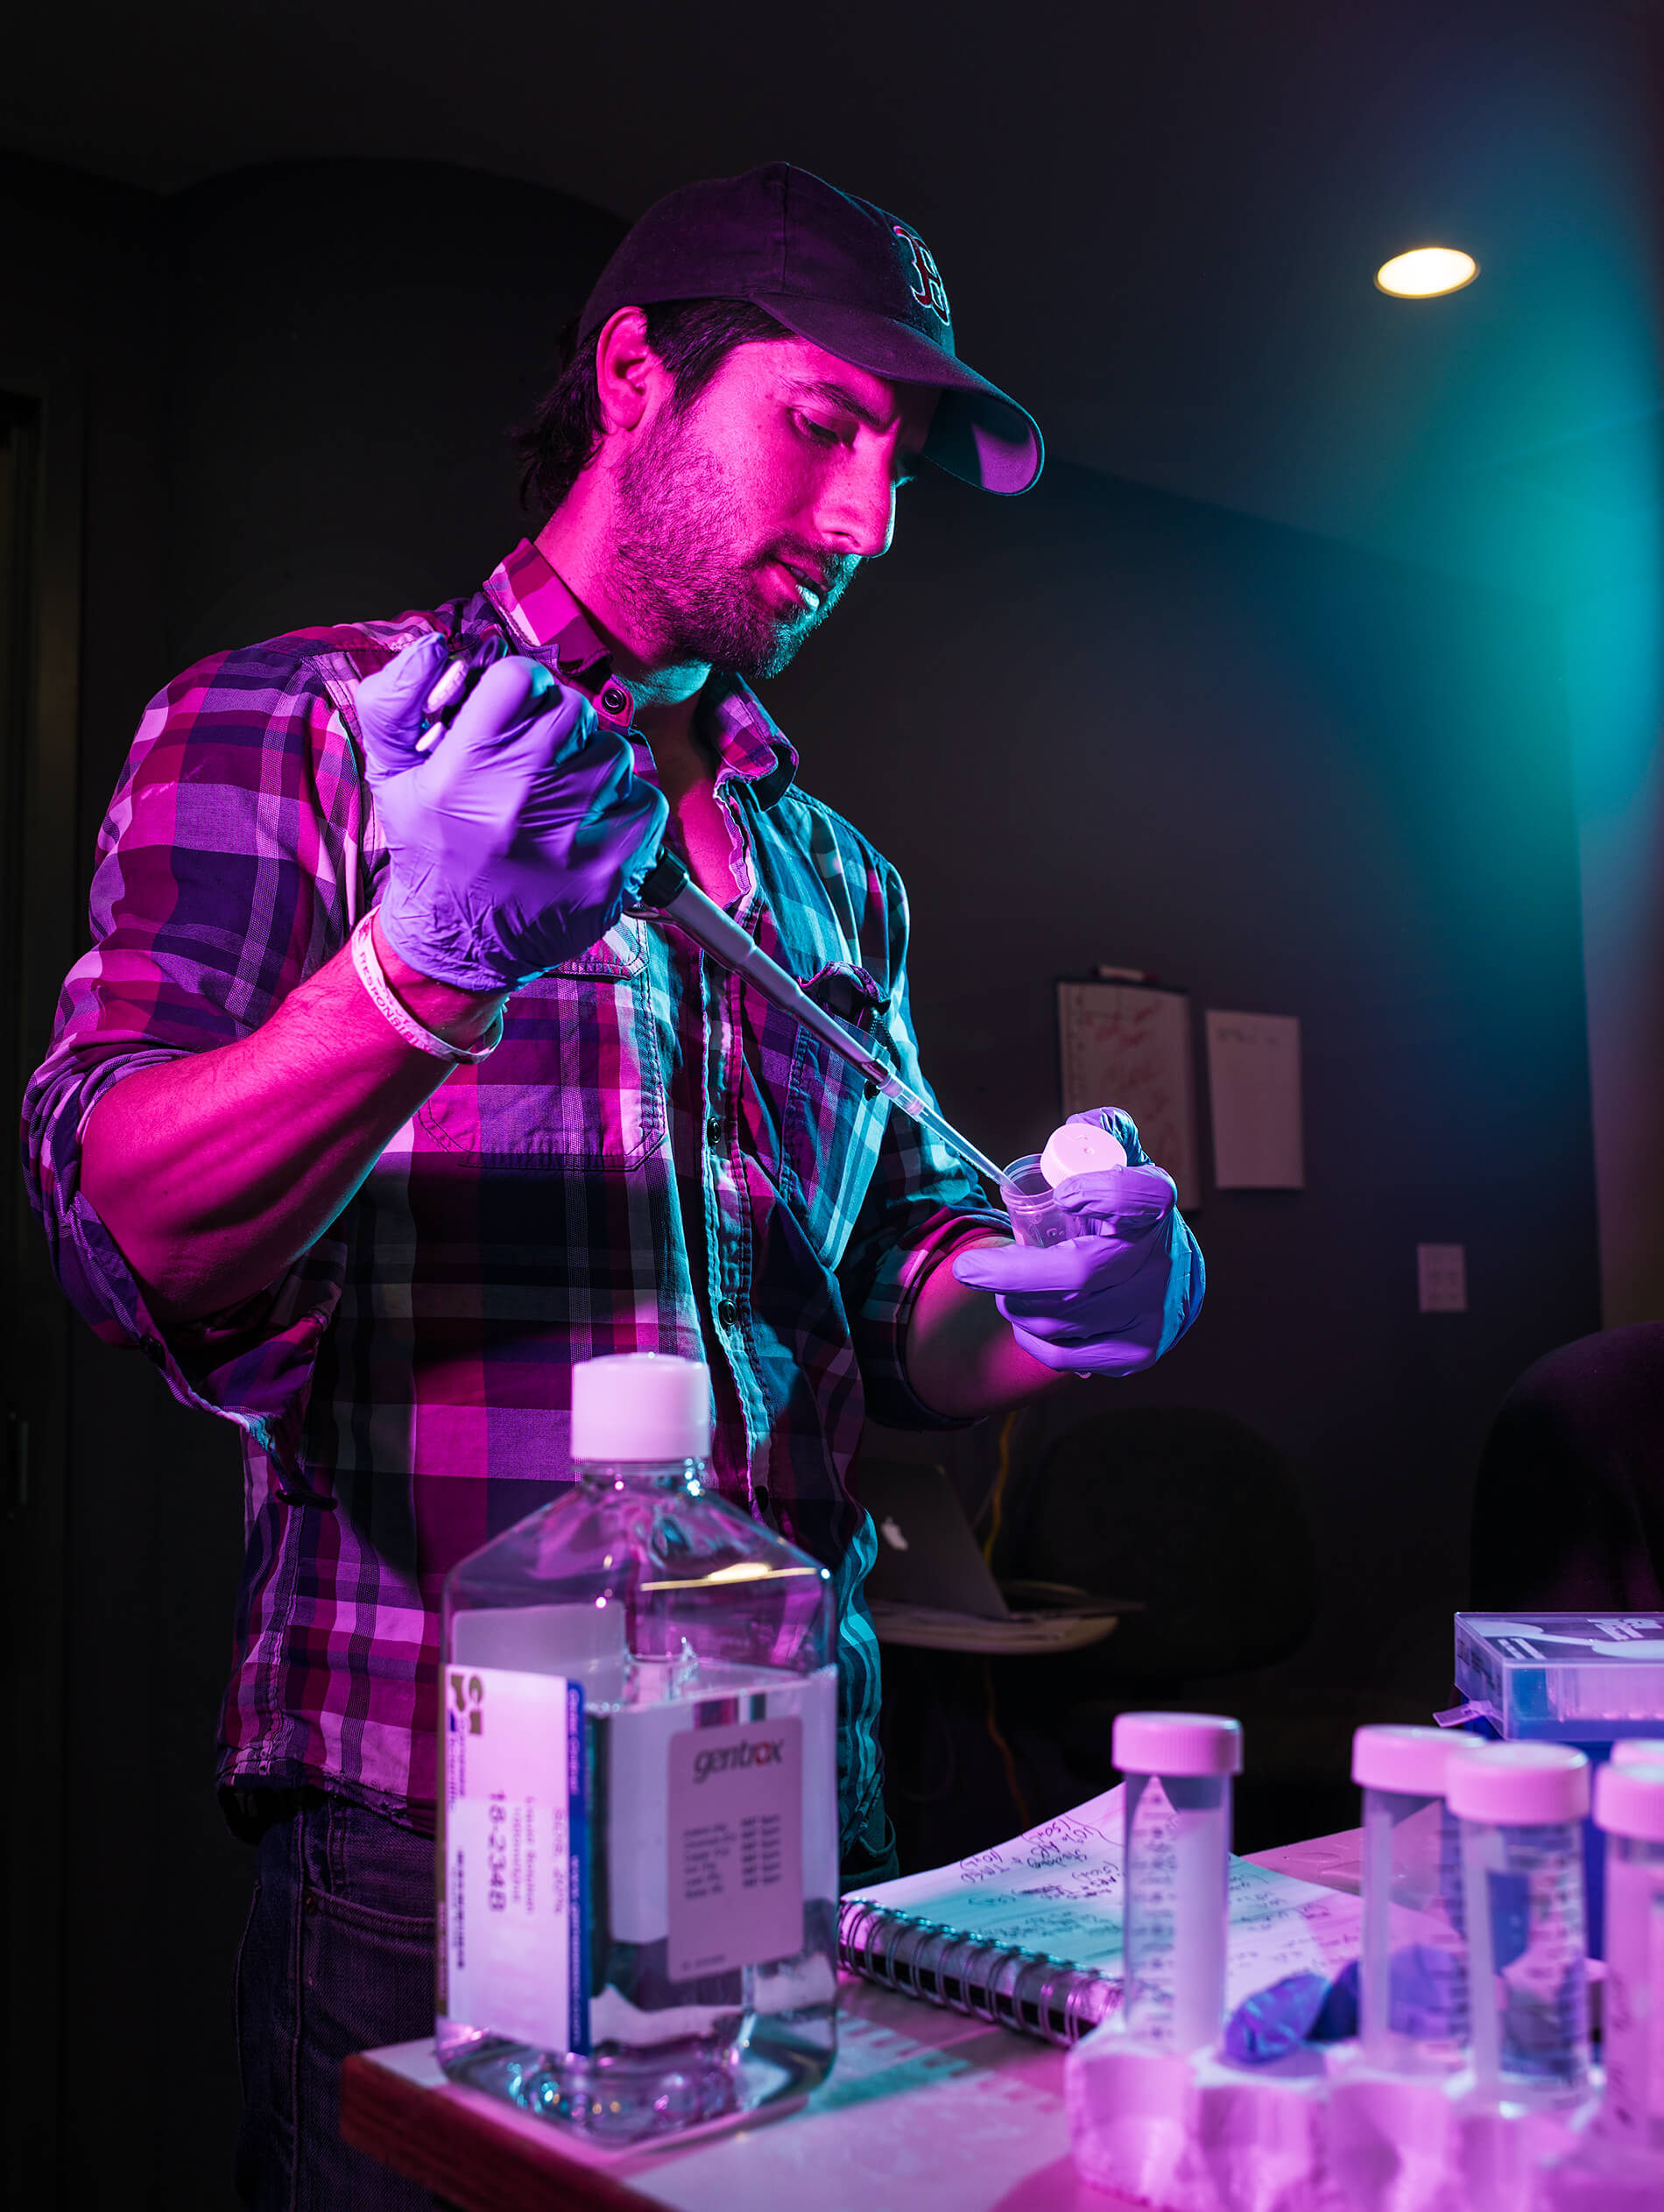 David Andel of Clara Foods working in Indie Bio lab